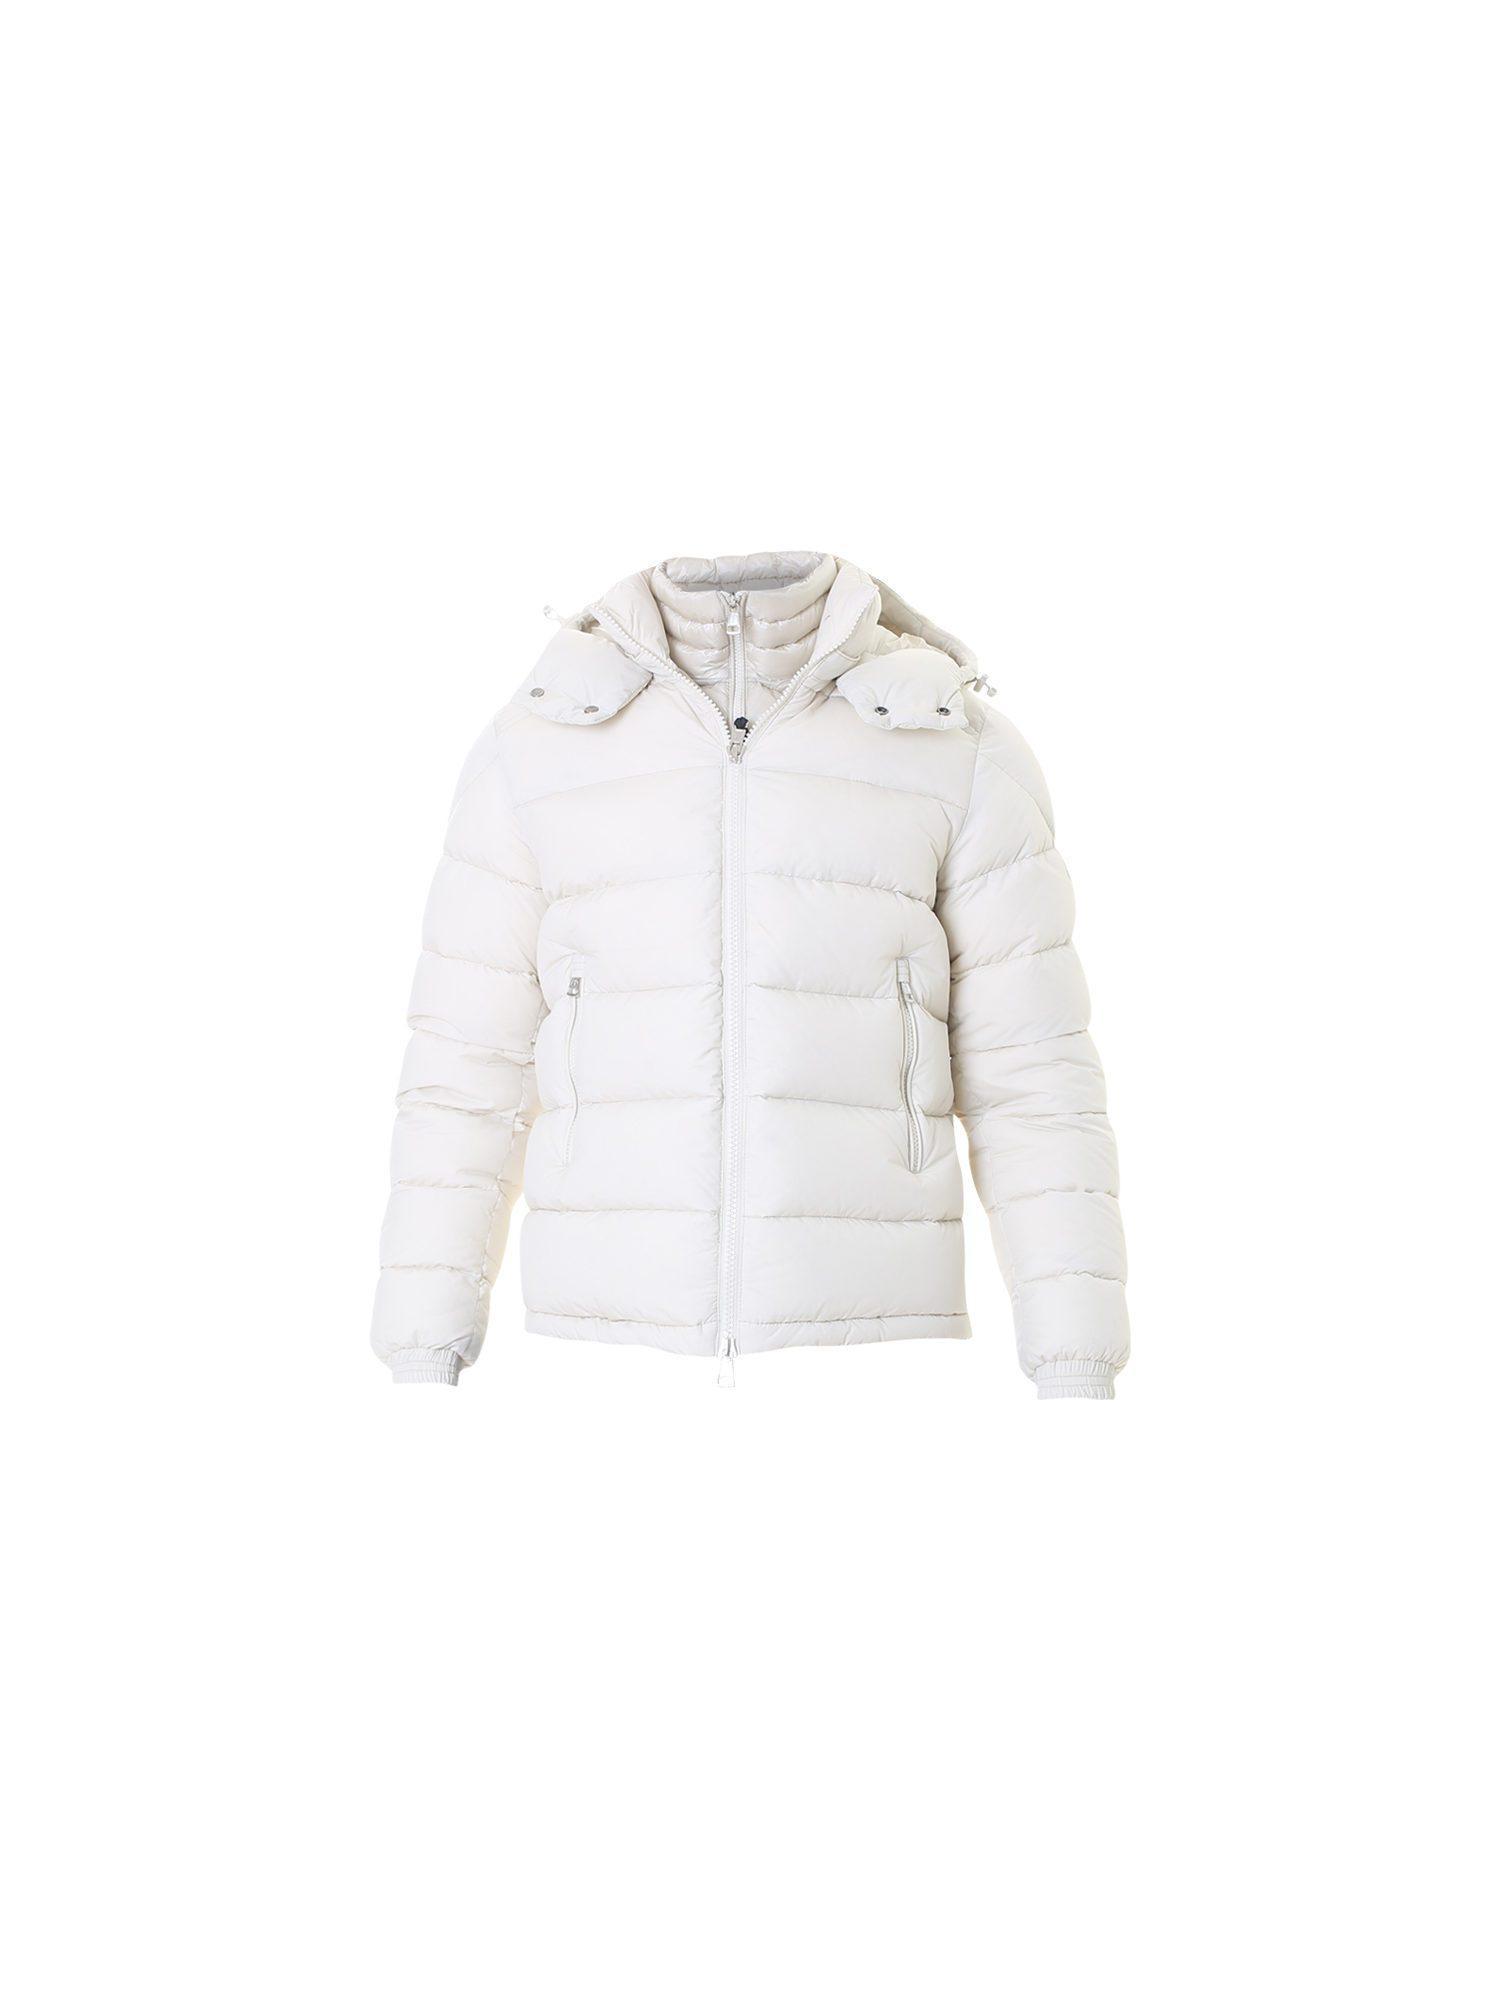 38b47a7402f1 Lyst - Moncler White Nylon Jacket in White for Men